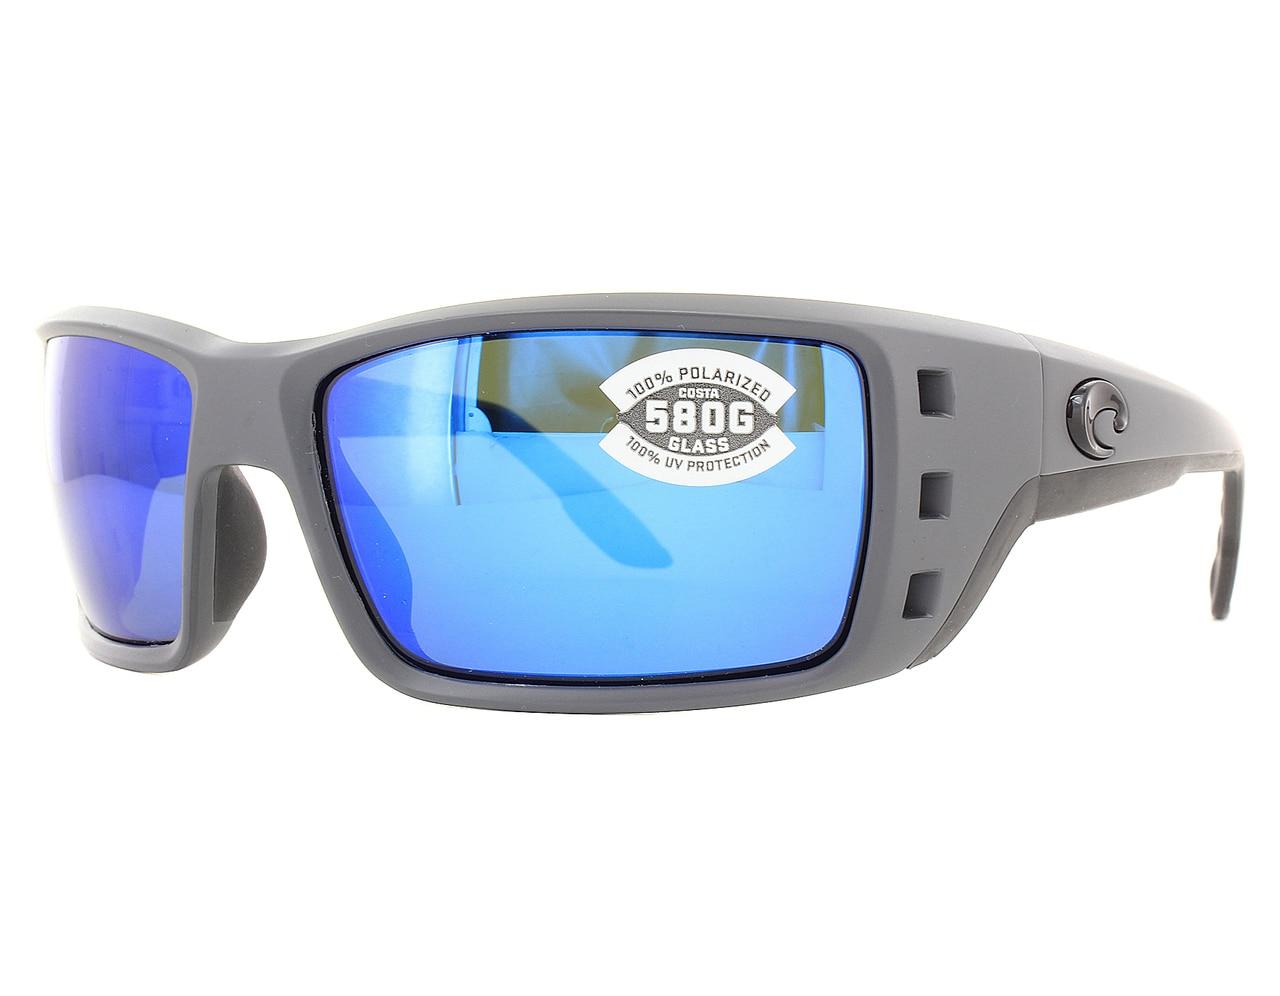 4d1650978e03f Details about New Costa del Mar Permit Blue Mirror PT98-OBMGLP580G  Sunglasses